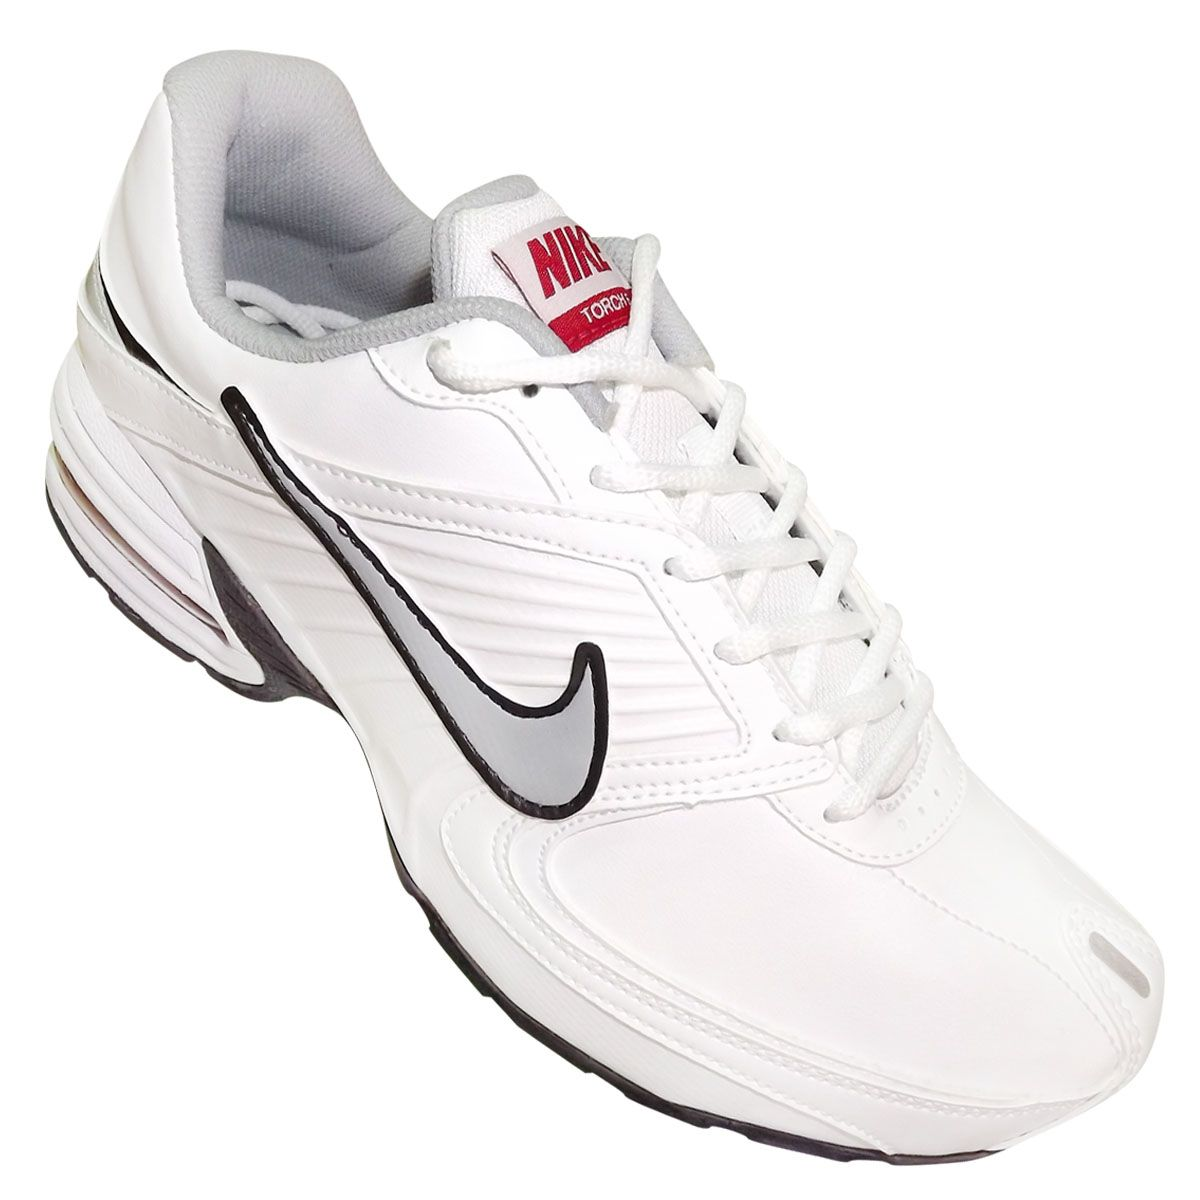 Nike Air Max Torch 6 SL SI BR branco_cinza (1).jpg (1200